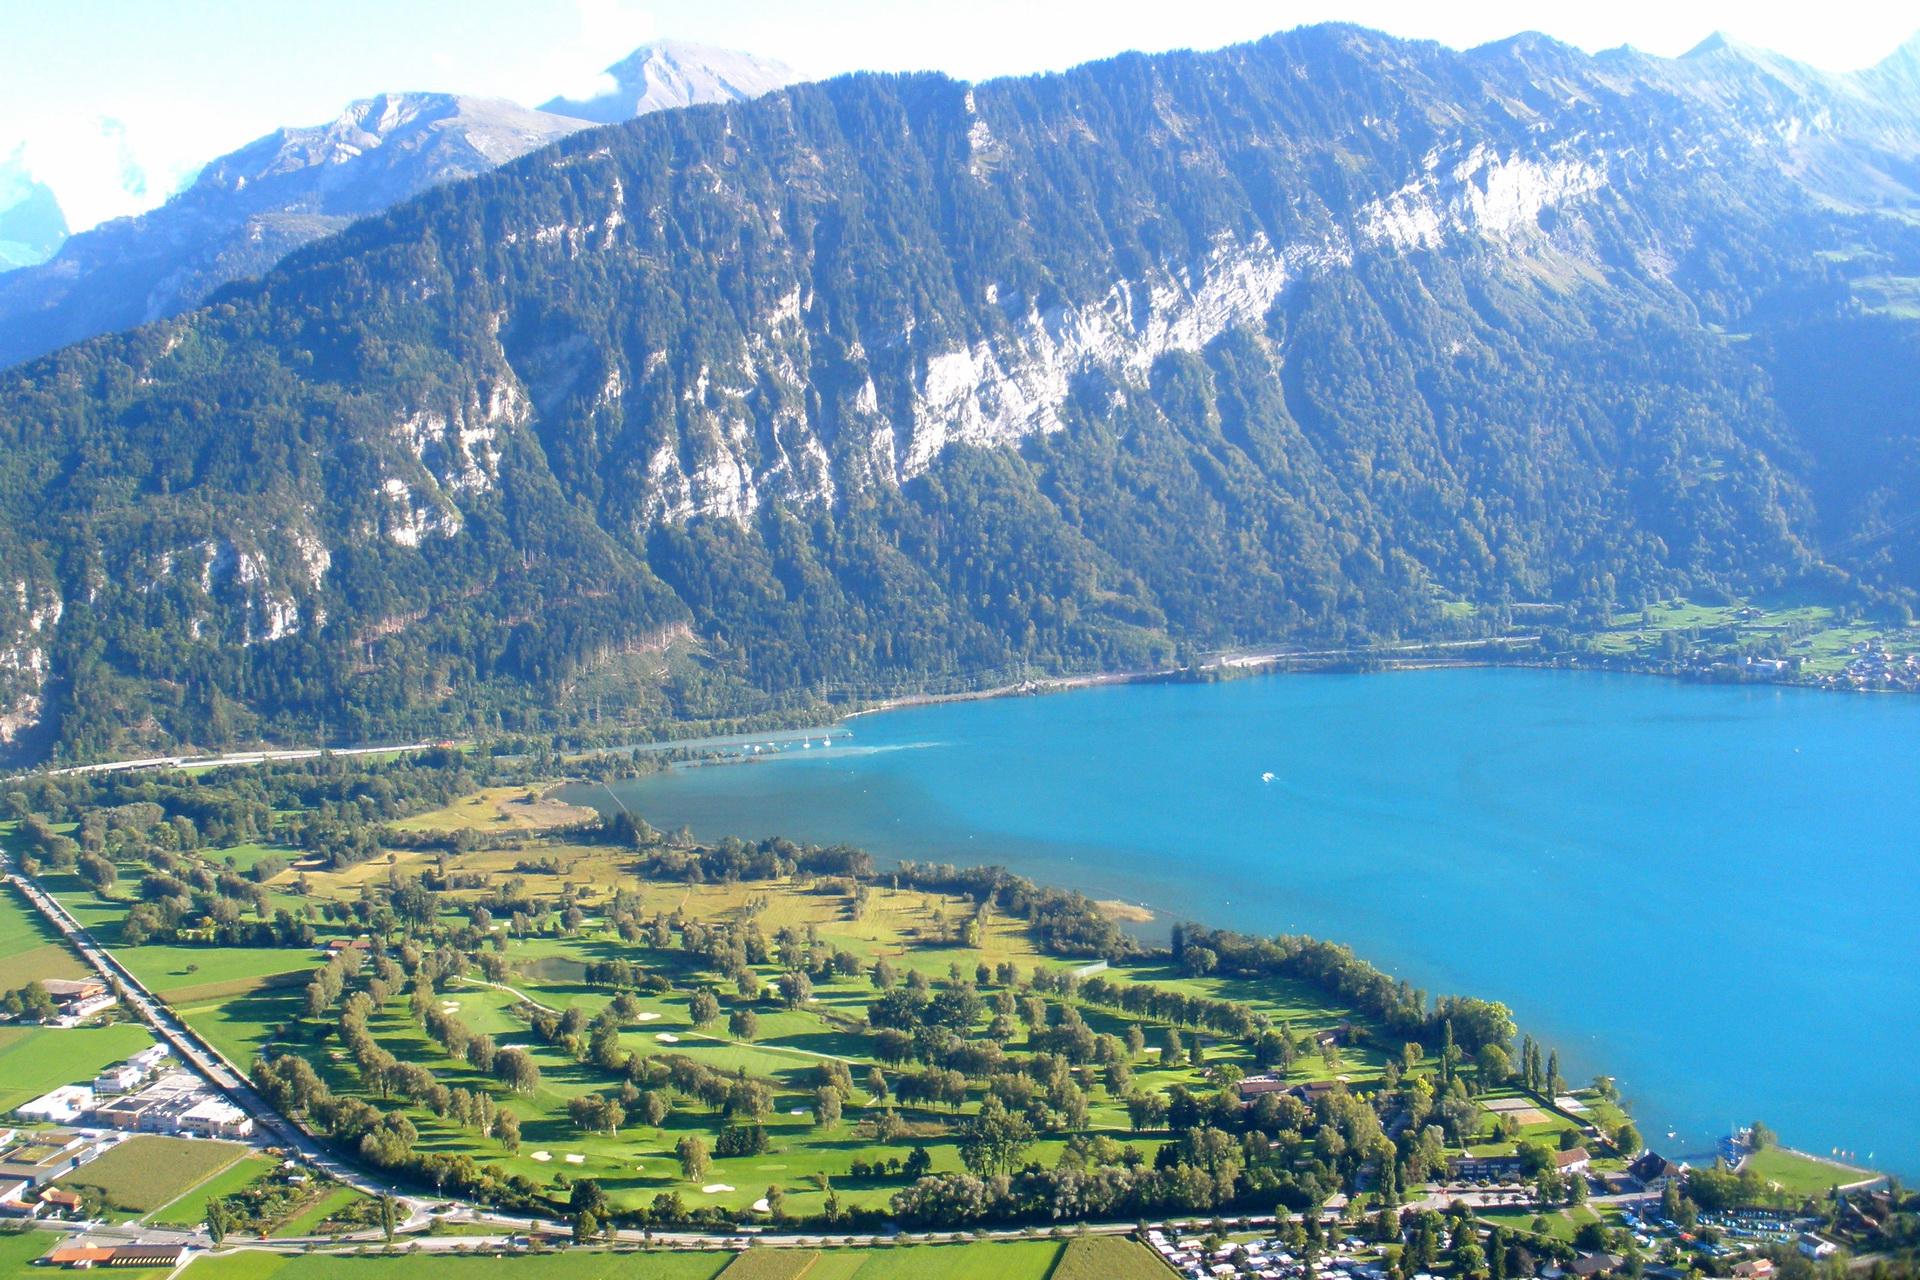 Images Interlaken SWITZERLAND Nature mountain 1920x1280 1920x1280